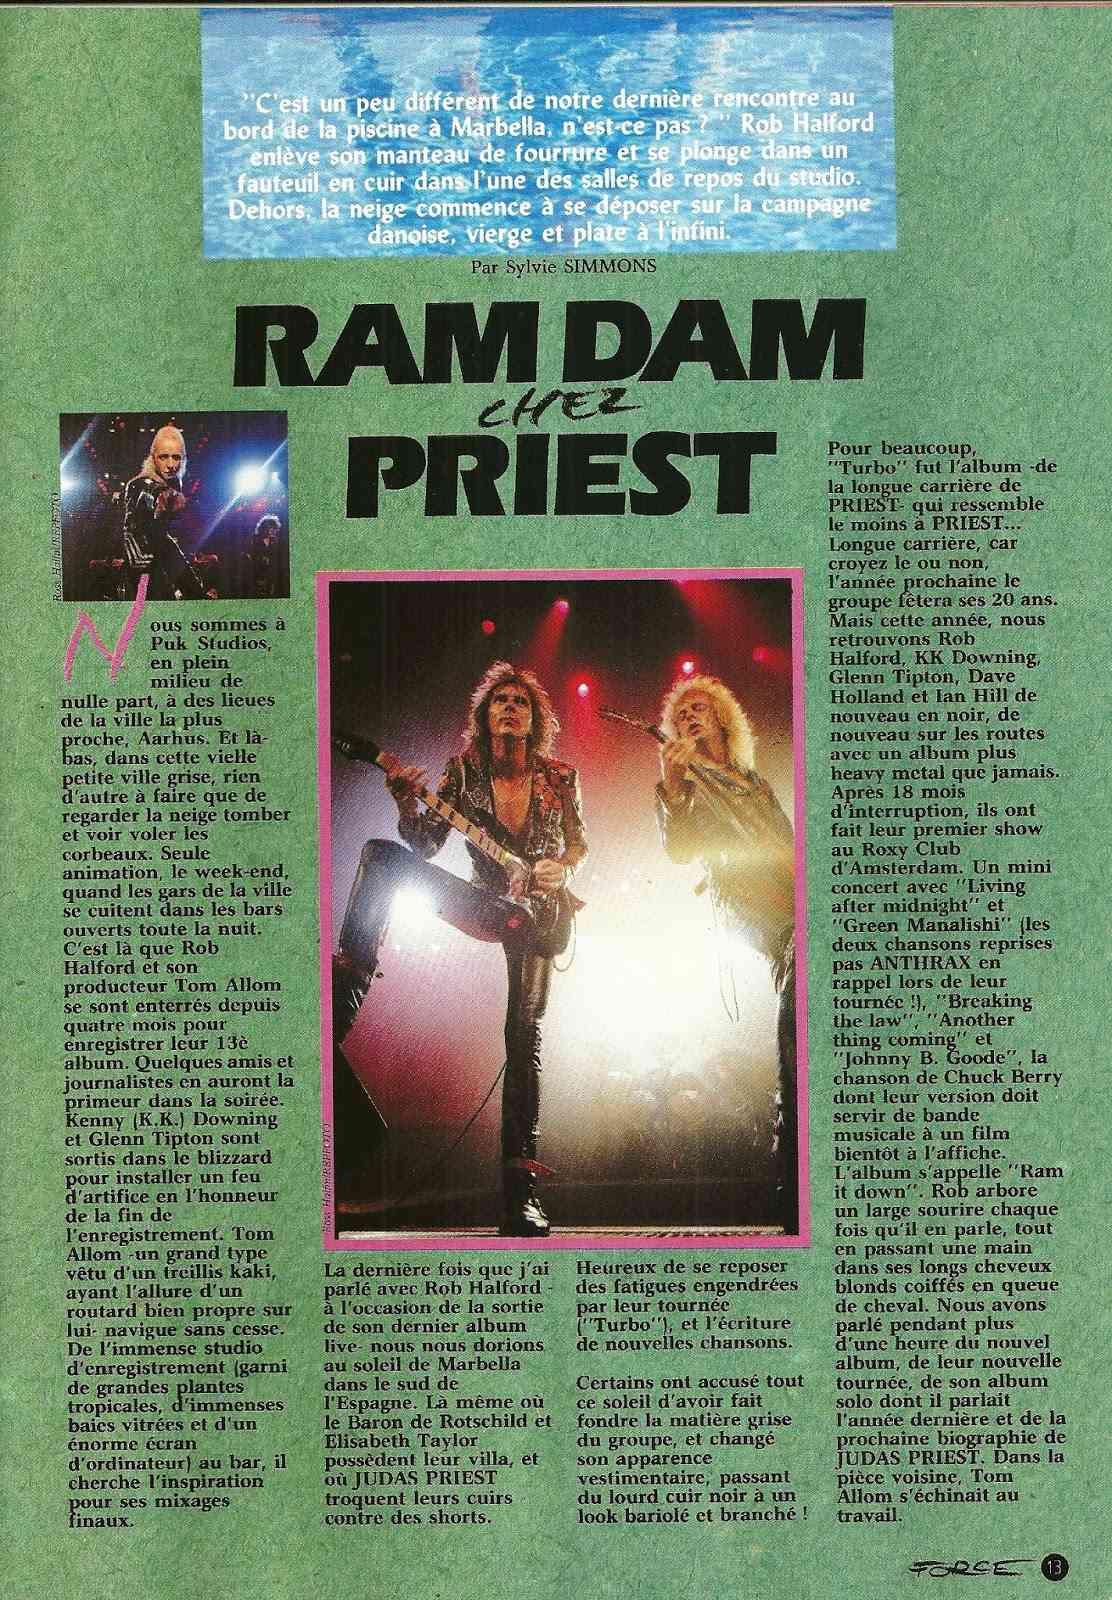 RAM DAM CHEZ PRIEST par Sylvie Simmons (Hard Force Mai 1988) Numyri20